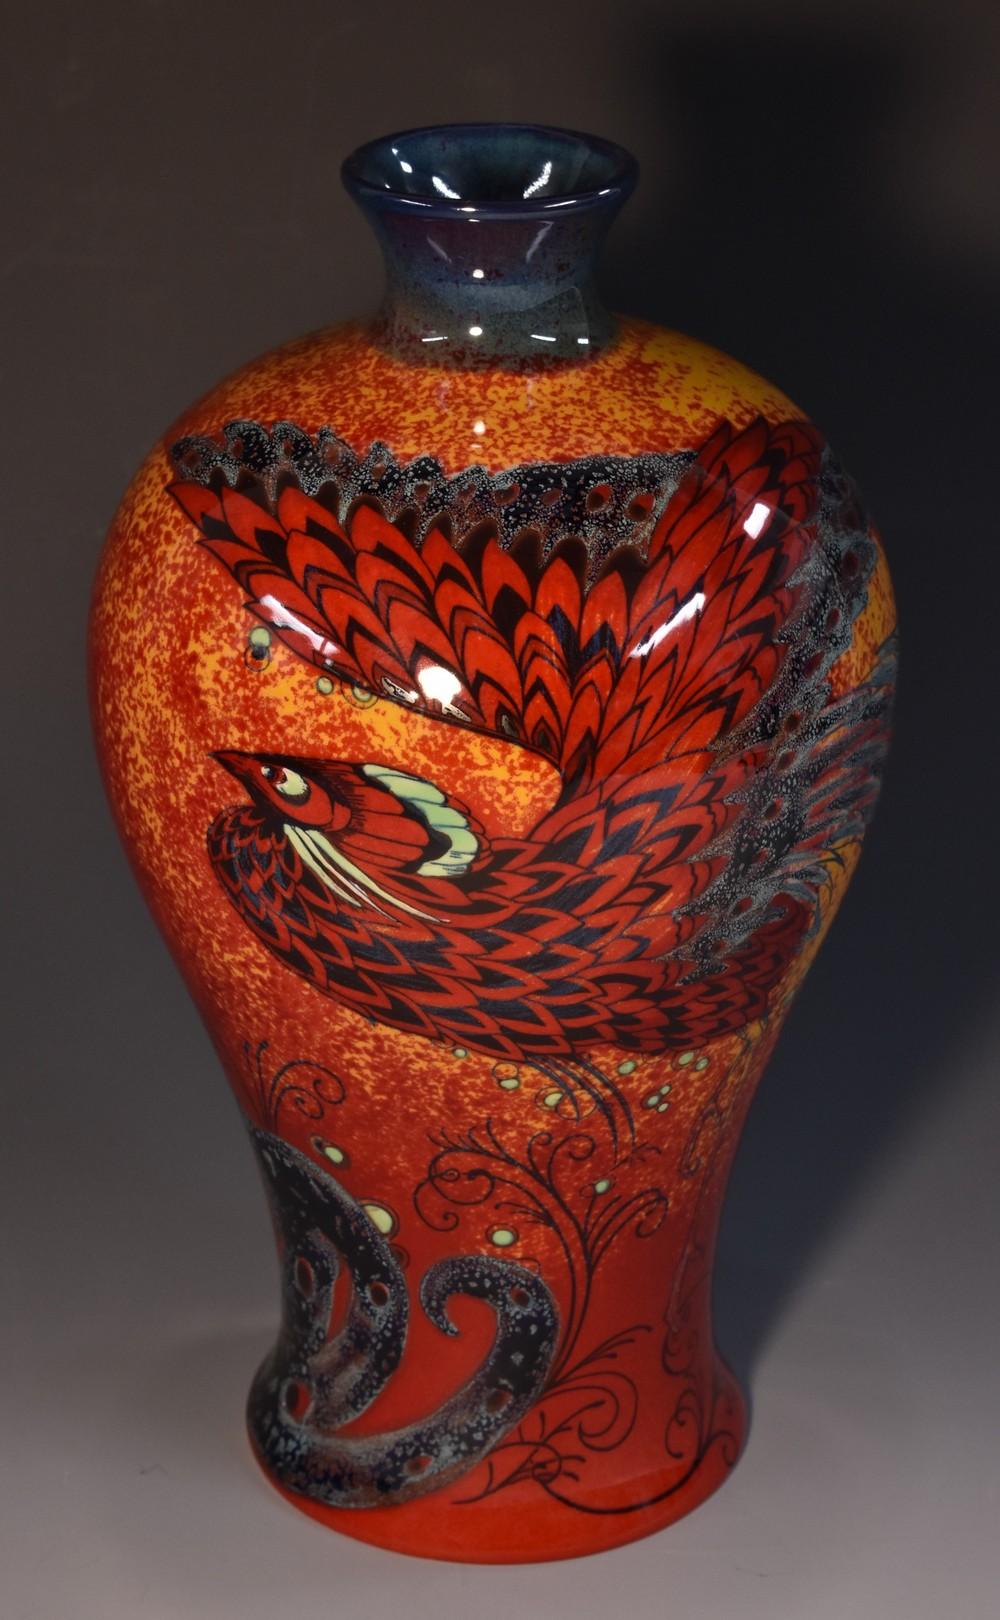 A royal doulton burslem artwares bird of paradise vase 129 lot 25a a royal doulton burslem artwares bird of paradise vase no reviewsmspy